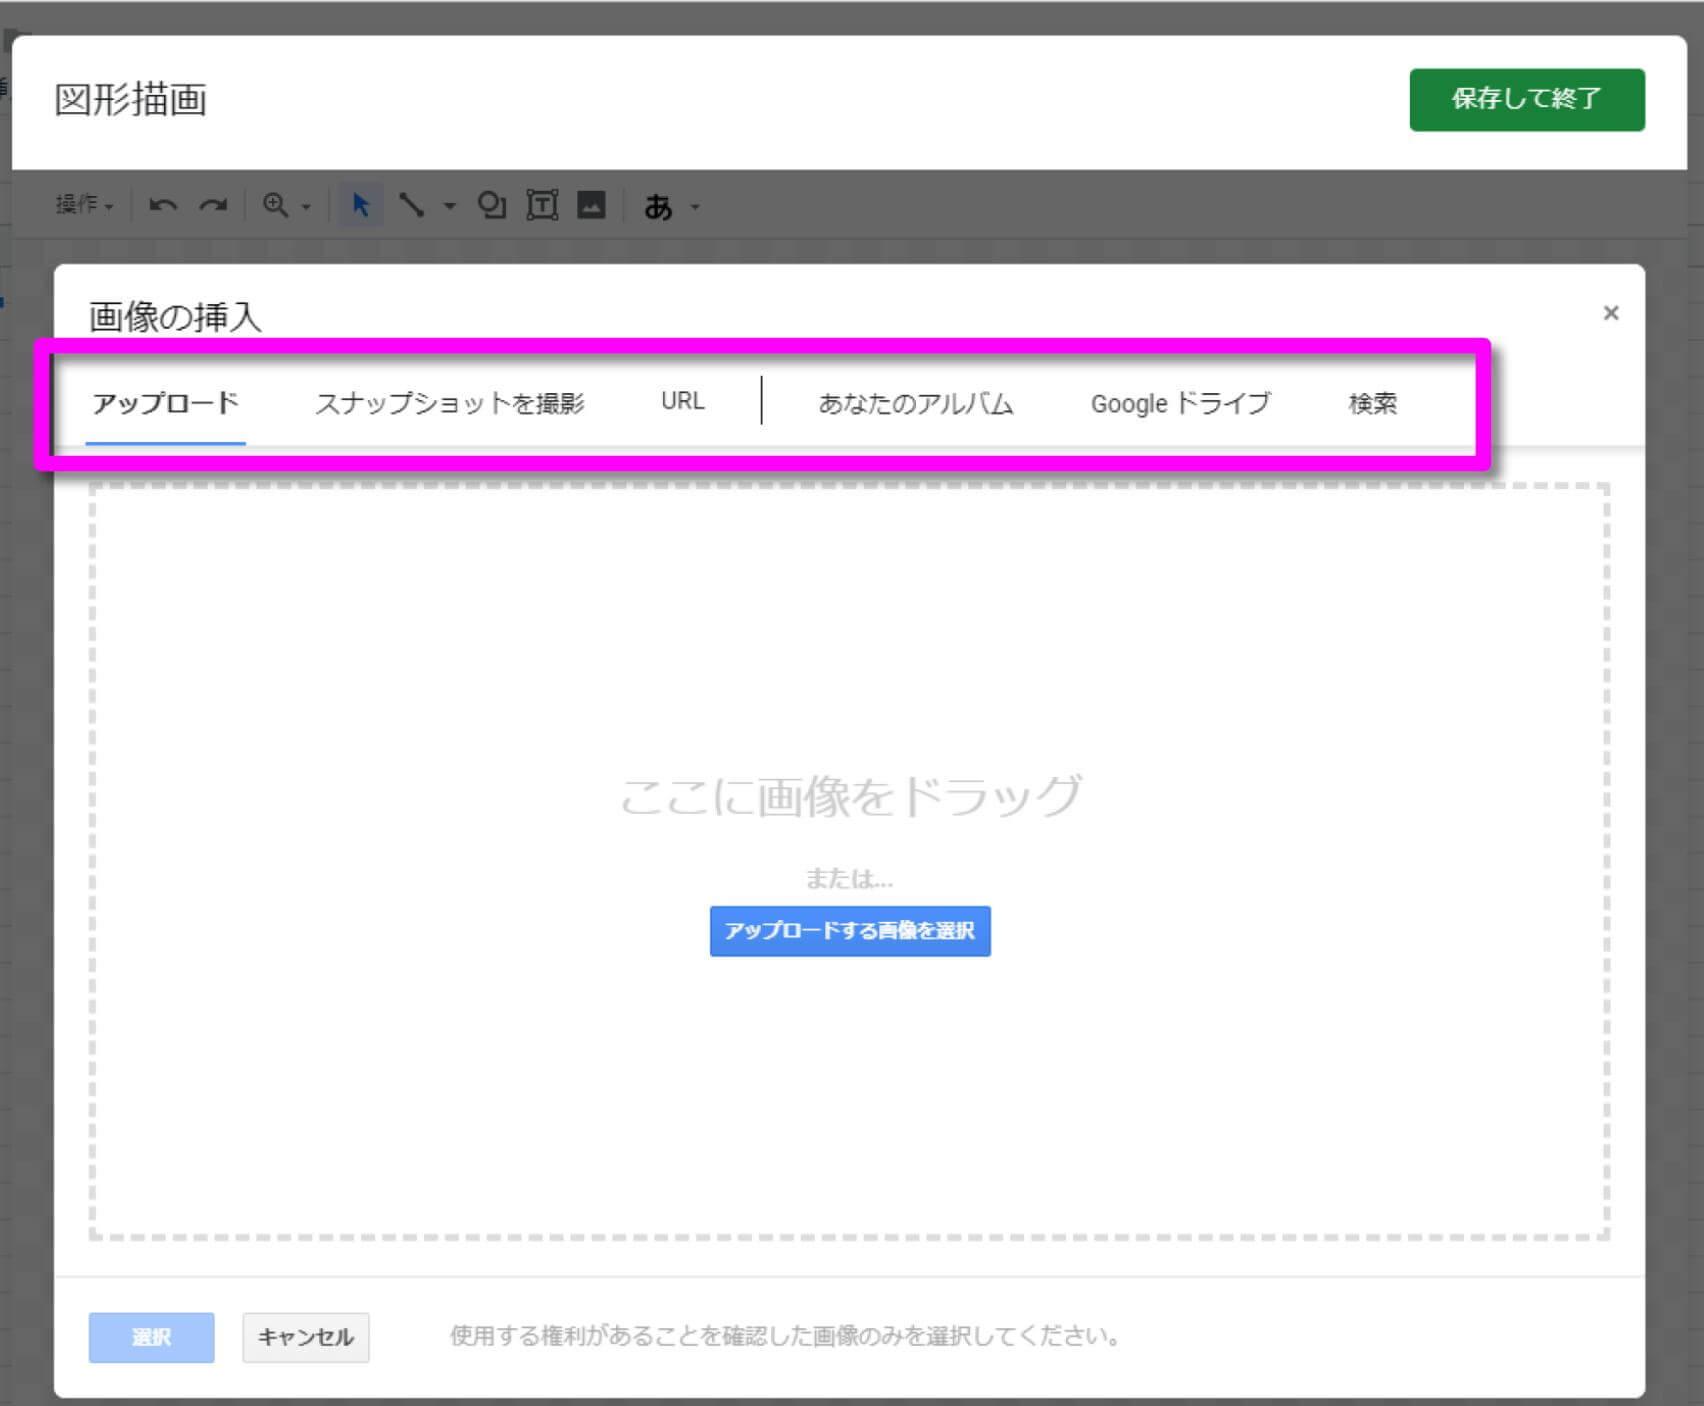 Googleスプレッドシートの図形描画で画像を挿入する方法・画像の挿入